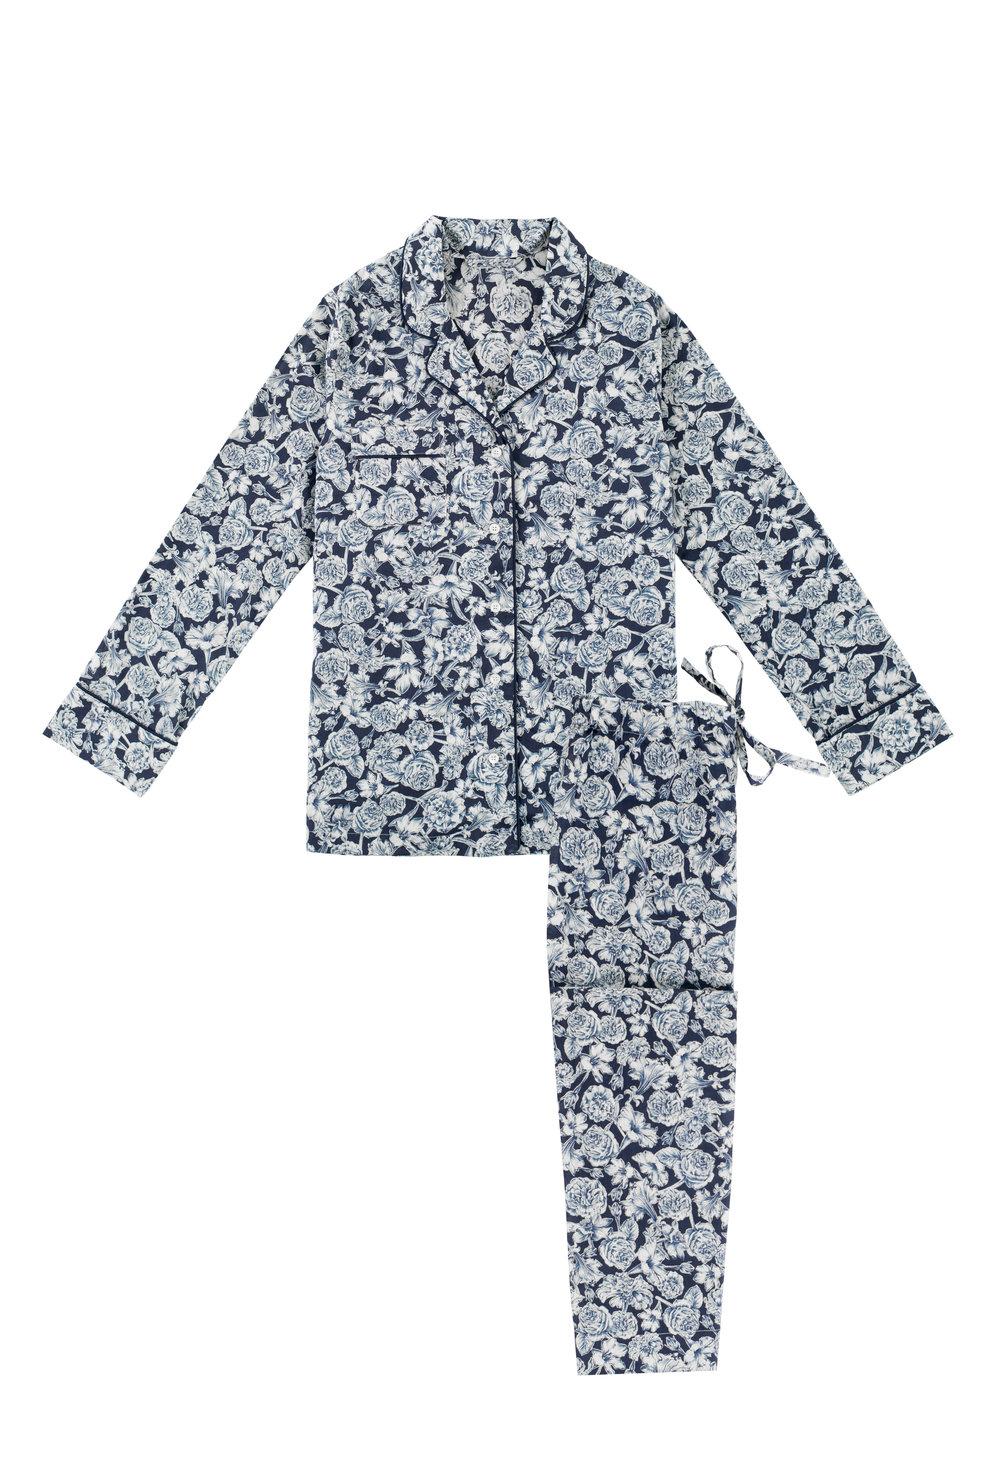 a5ce0290dd25 Women s Liberty Blue Floral Print Pyjama Set — The Reach London